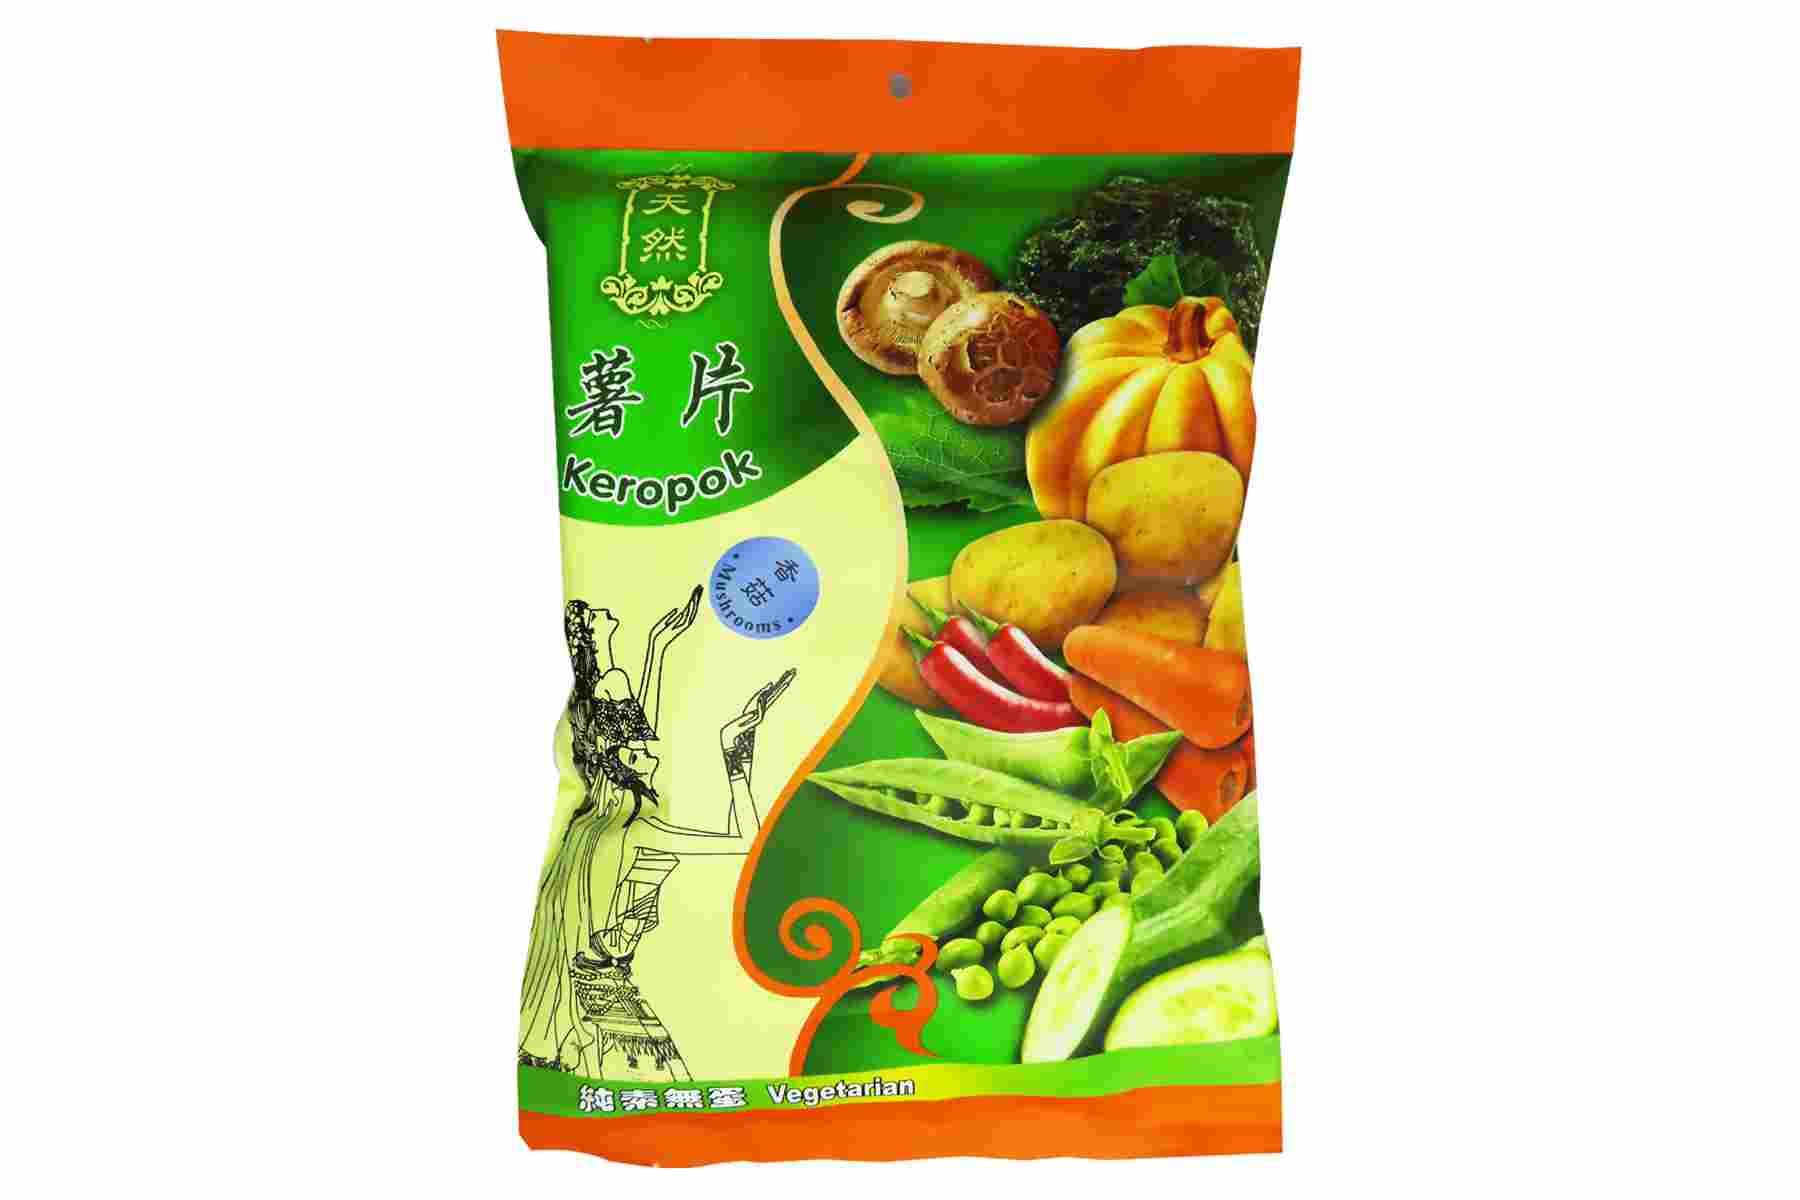 Image Kun Yi Mushroom Cracker 昆益 - 香菇薯片 40grams